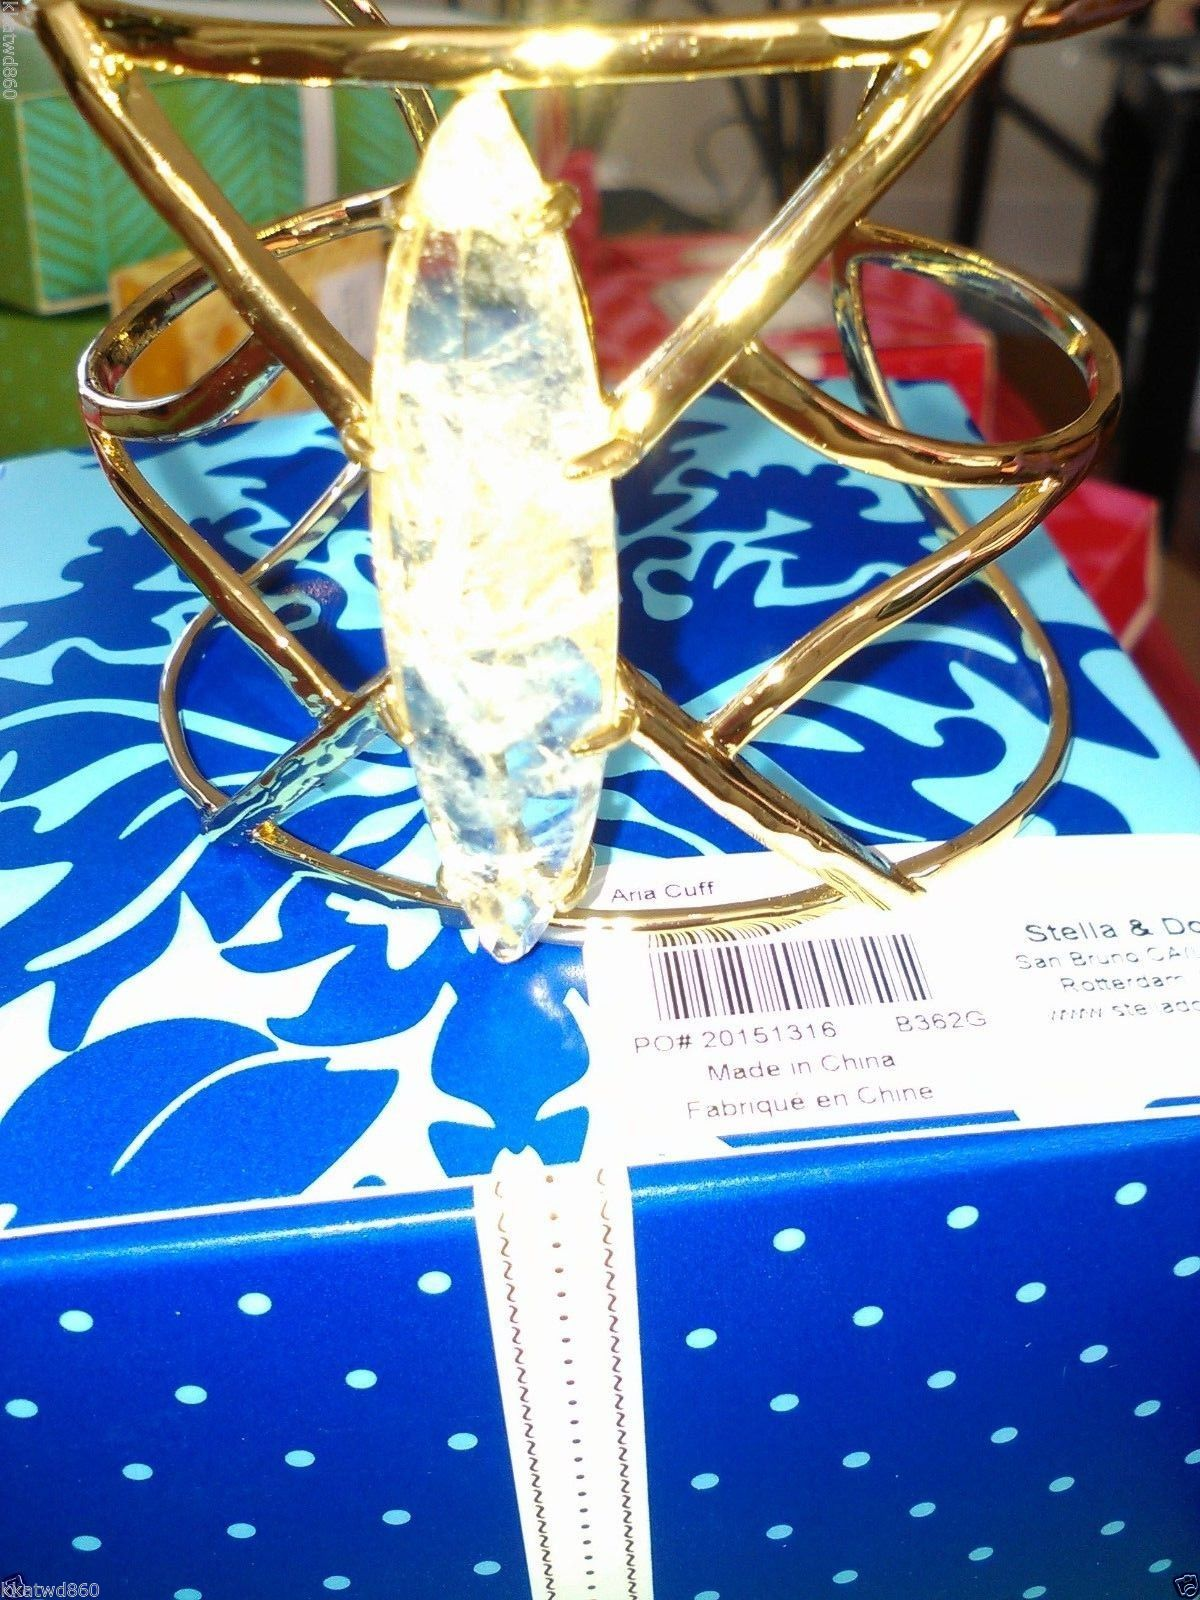 STELLA & DOT ARIA CUFF BRACELET Gold quartz New IN BOX Barcode TAG ON SIDE Fall